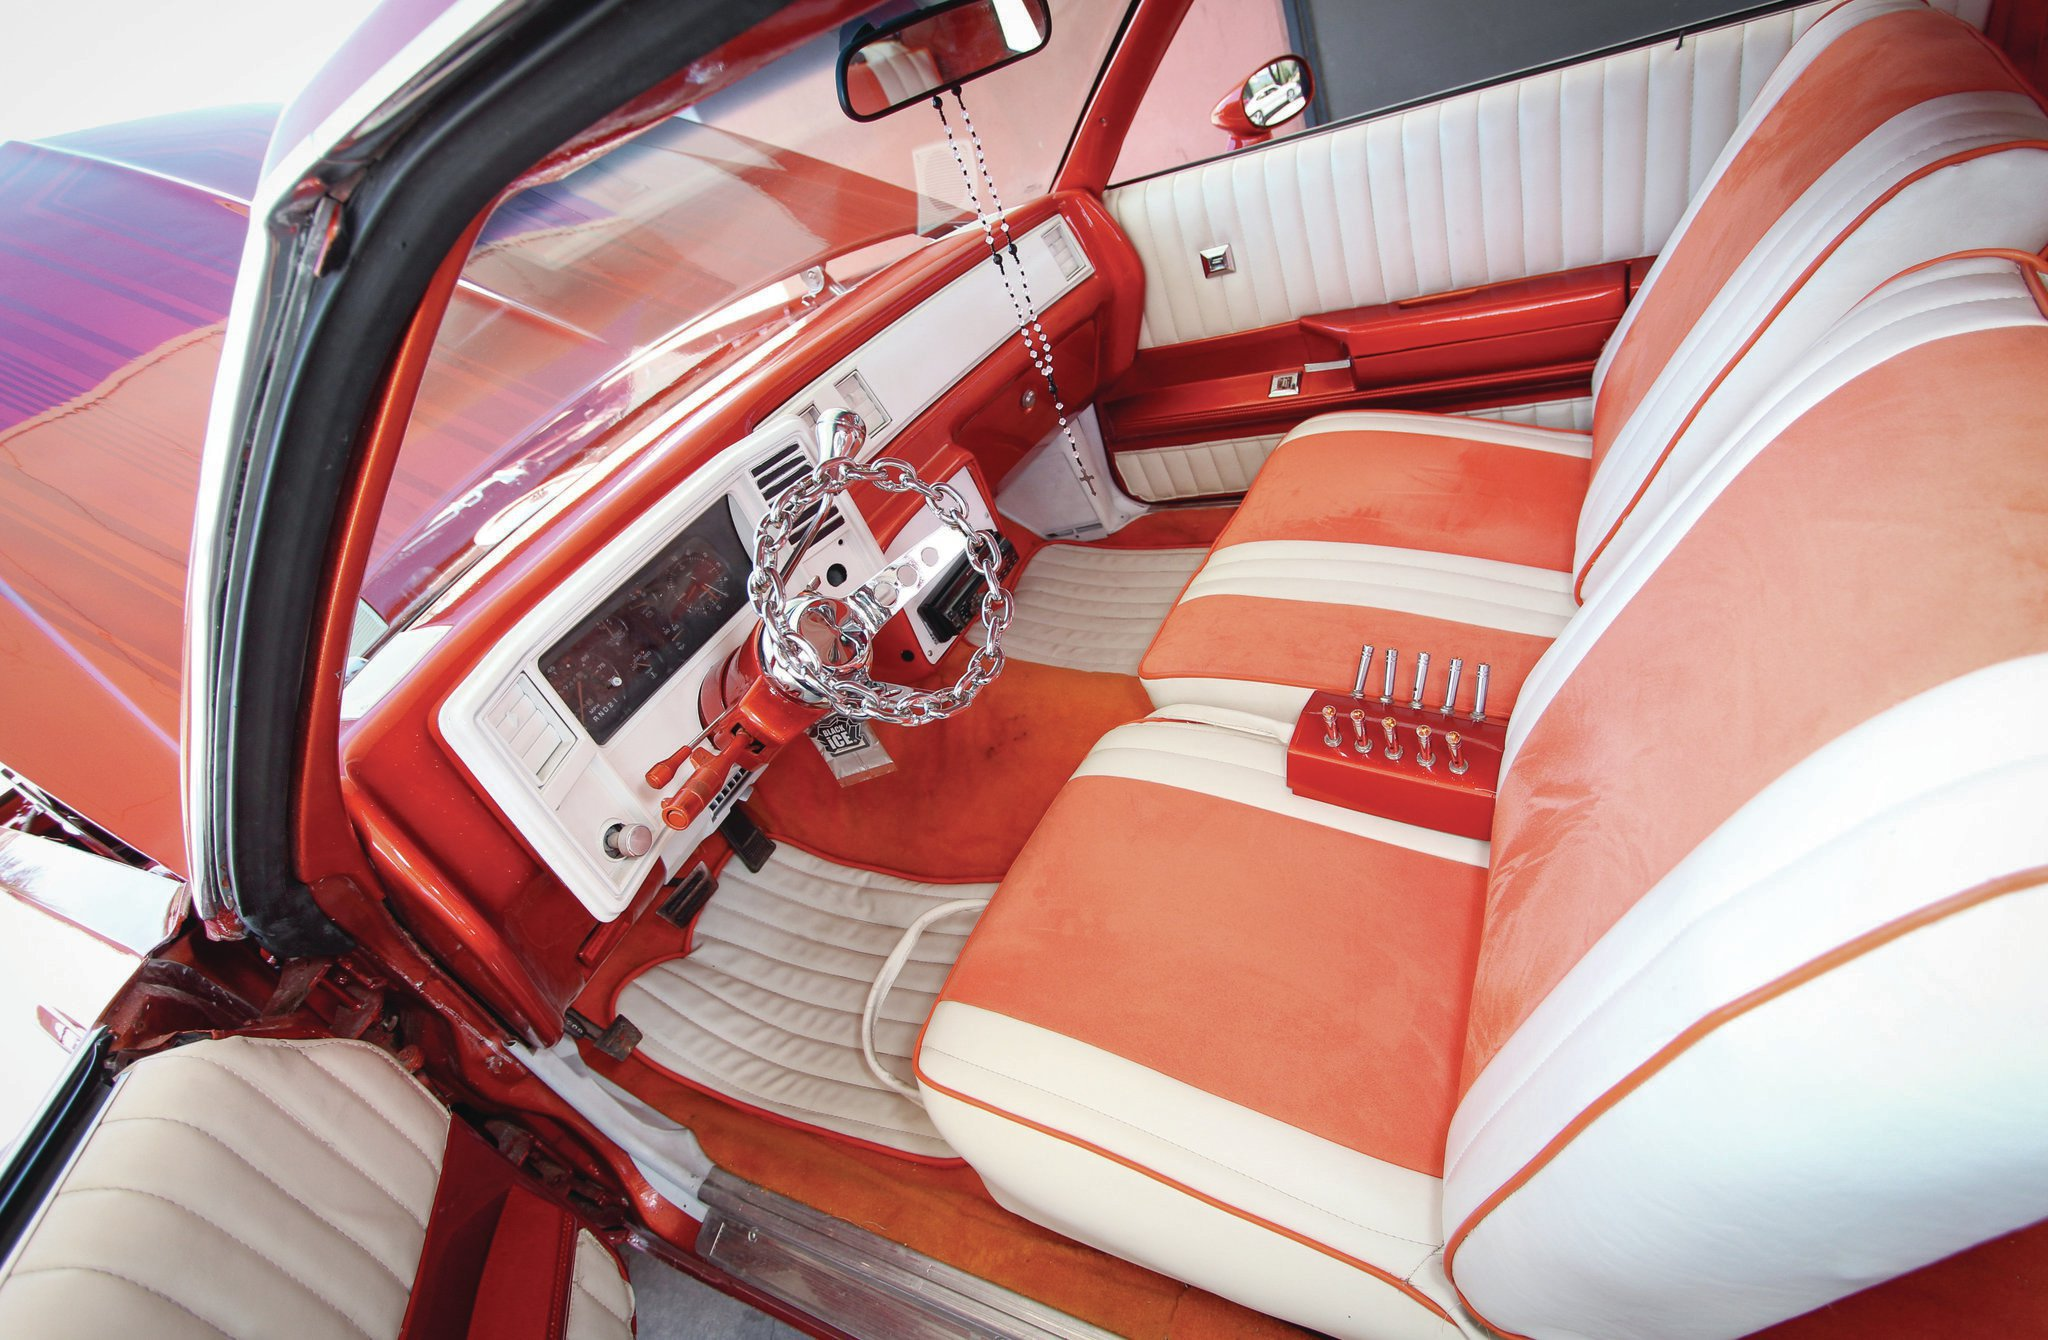 1984 Chevrolet Monte Carlo Monte Licious